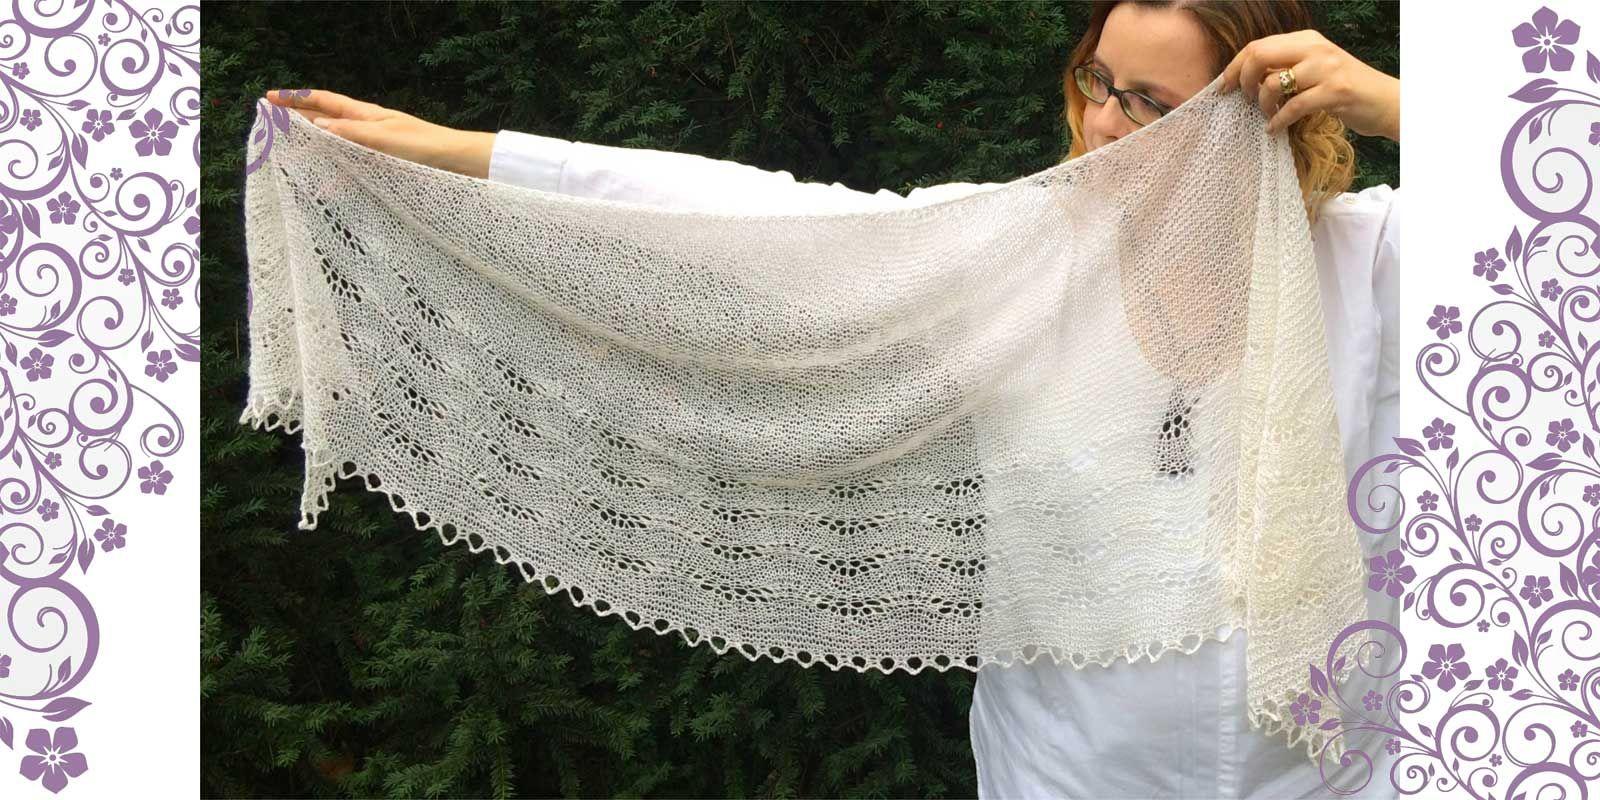 Onda Su Onda Shawl | Crescent shawl, Knitting patterns and Shawl